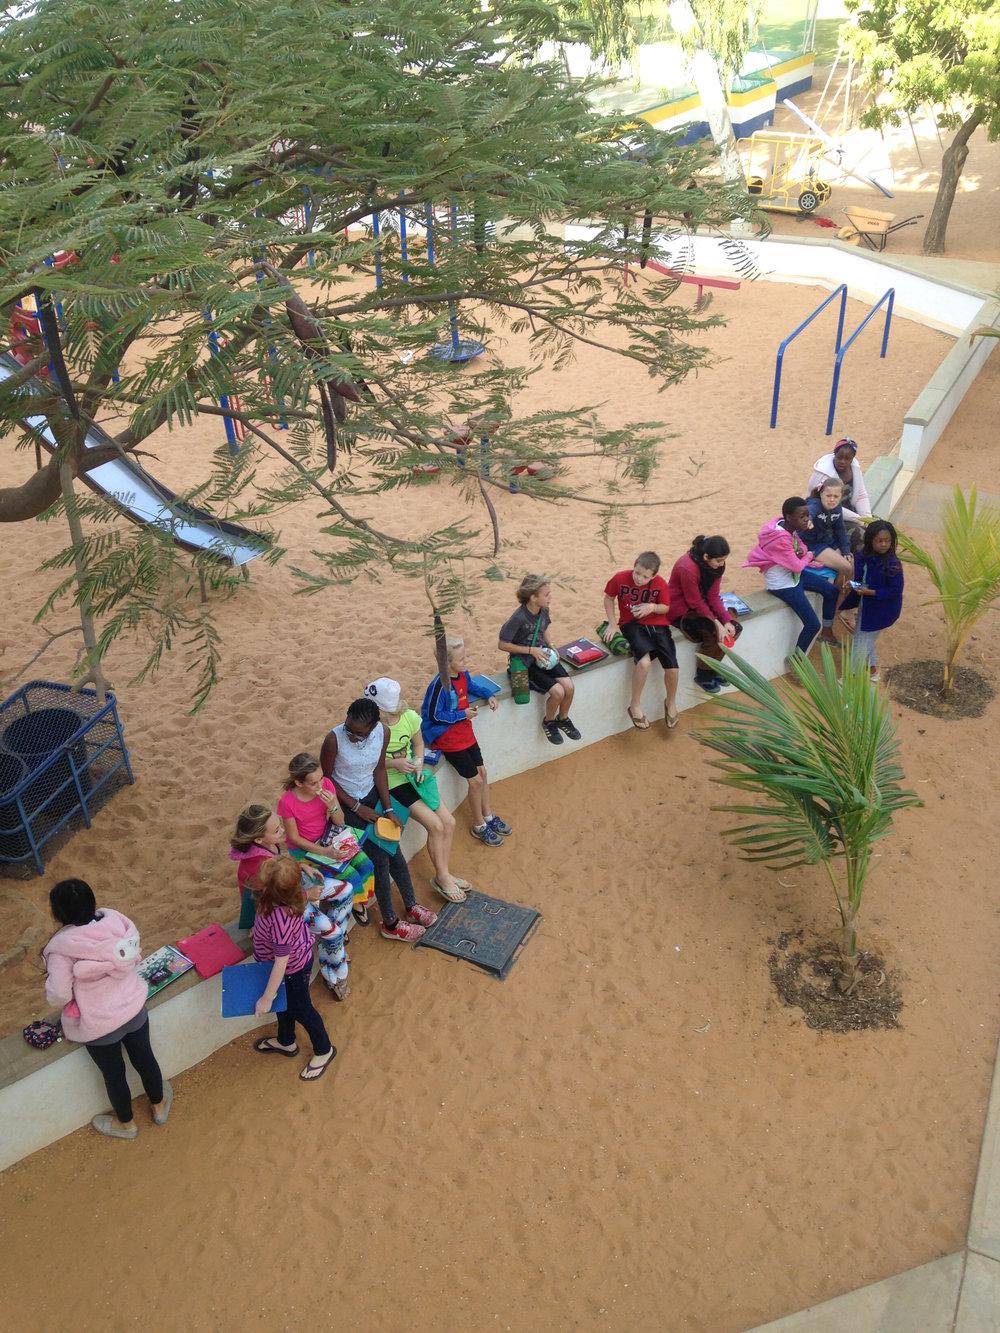 Dakar Academy is an international school in Dakar Senegal. An international community, more than 30 countries are represented in the student body.